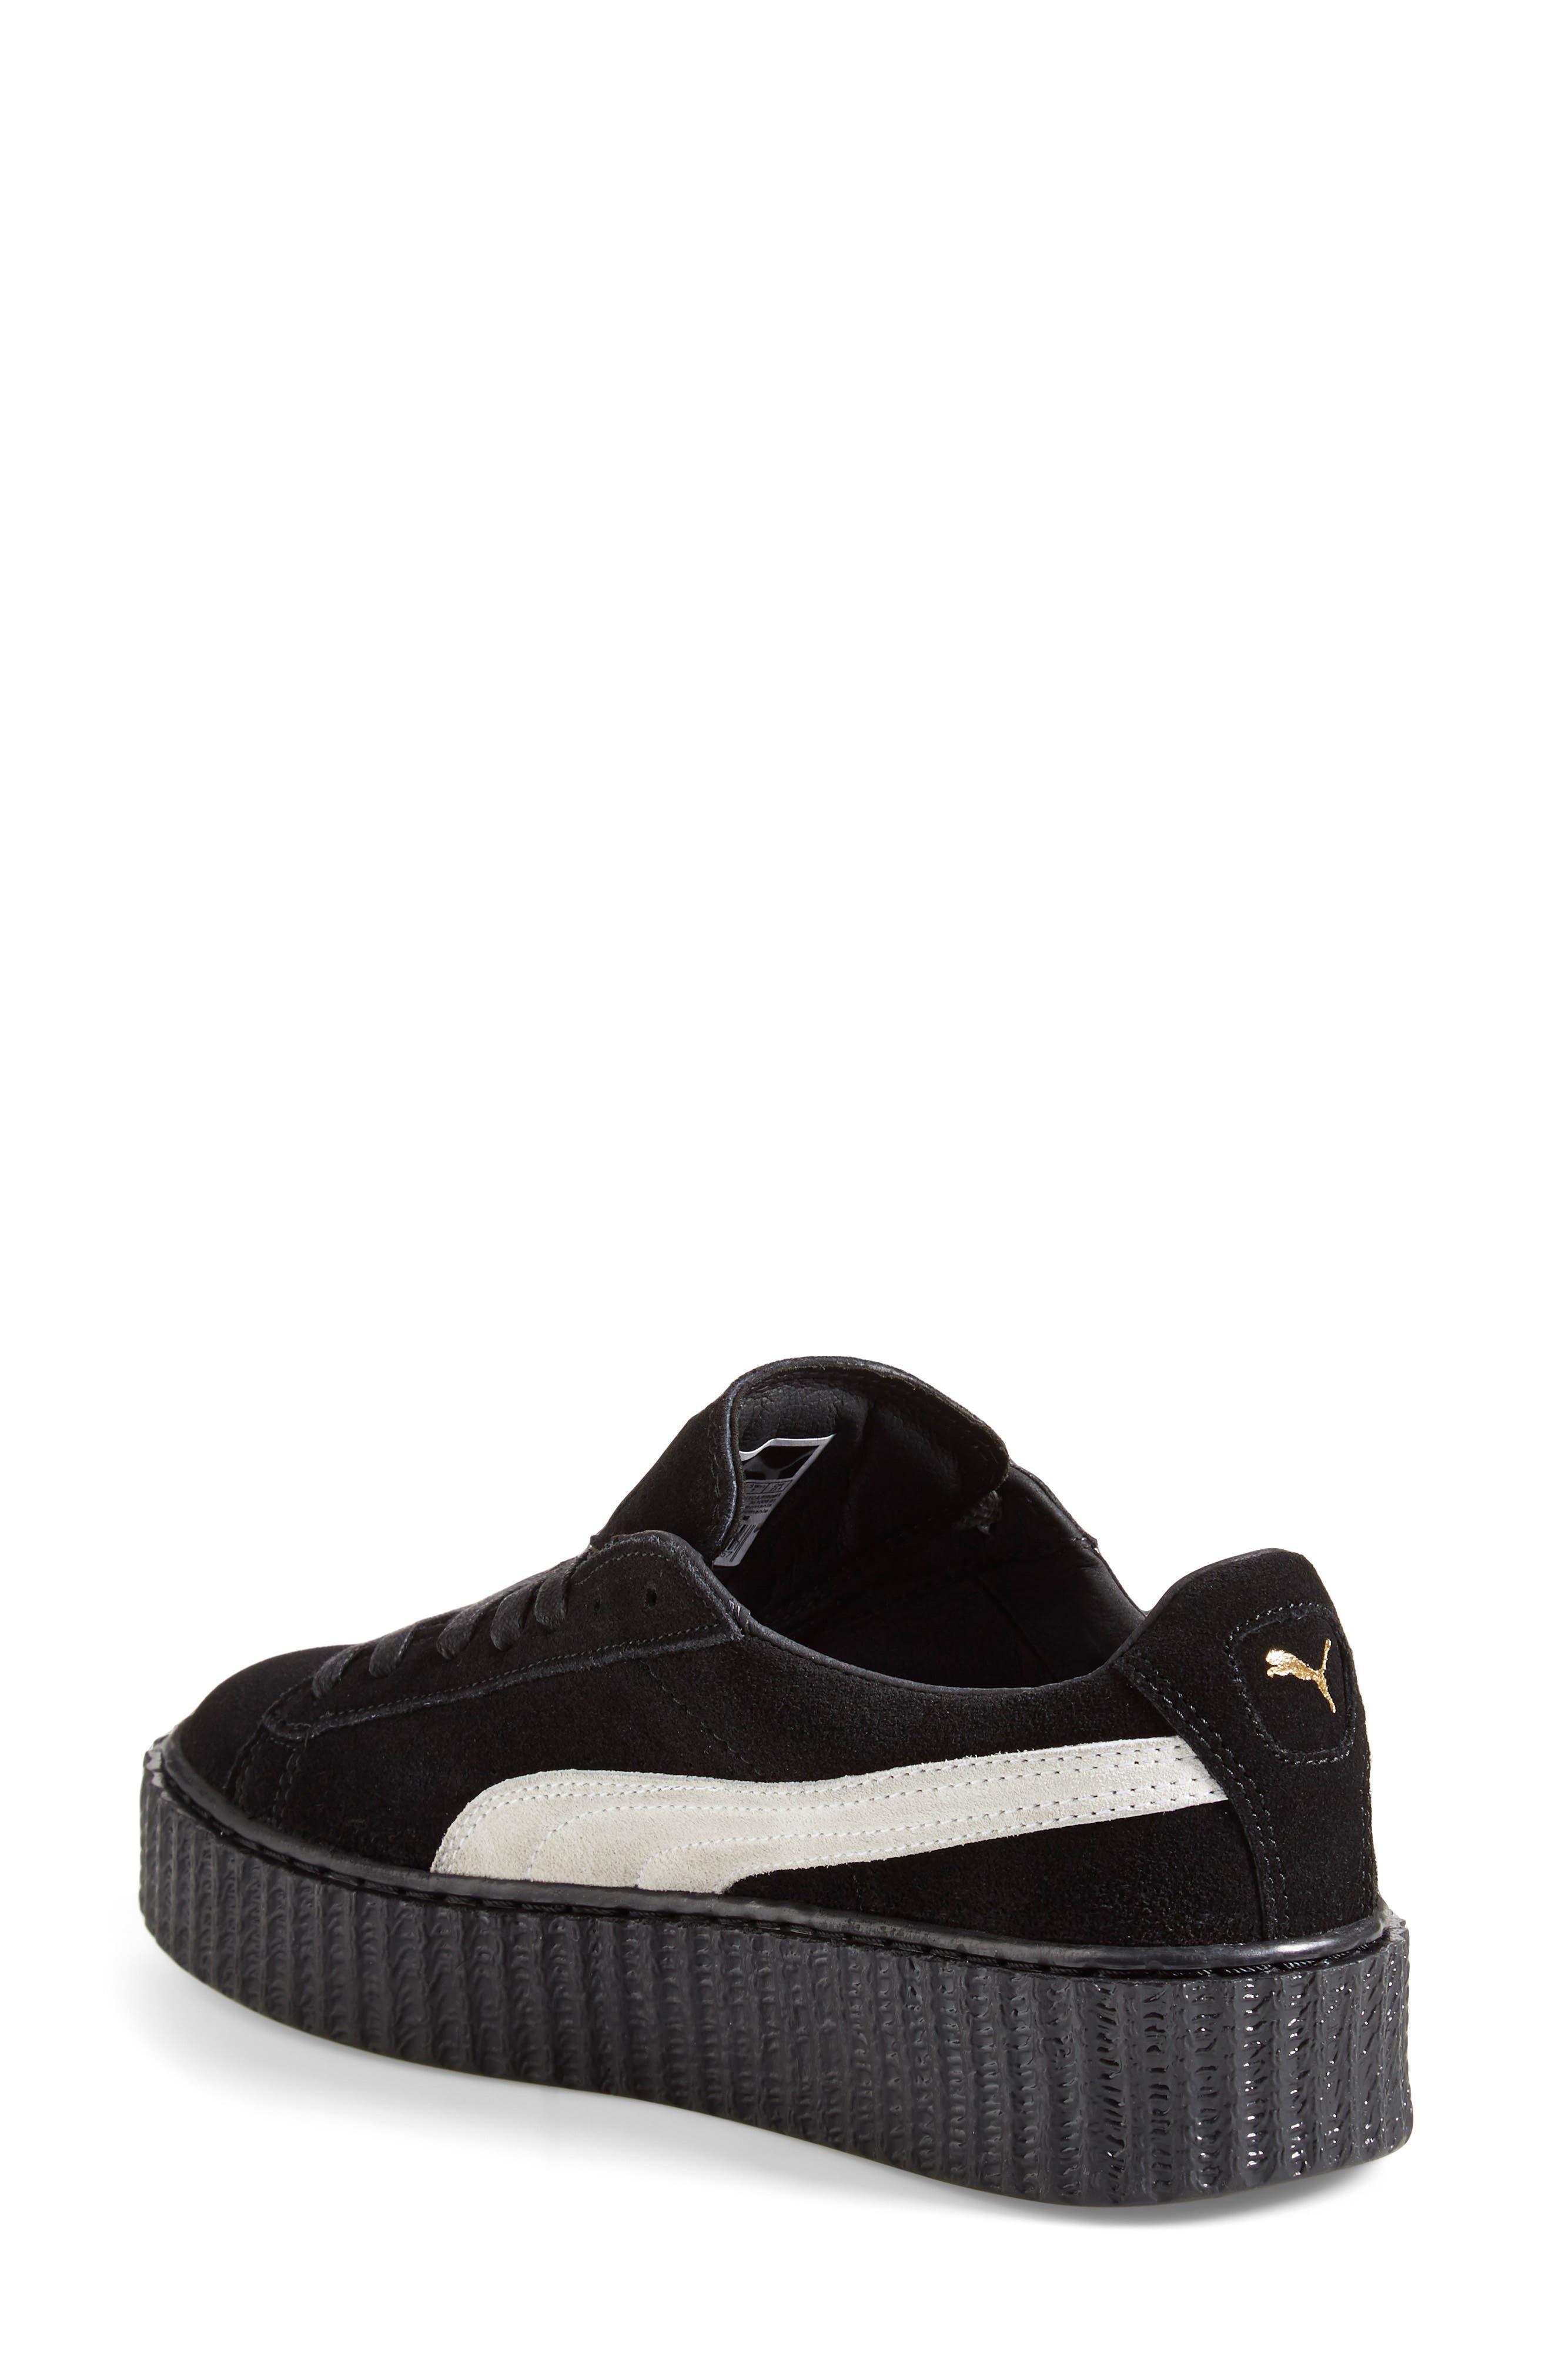 FENTY PUMA by Rihanna Creeper Sneaker,                             Alternate thumbnail 3, color,                             001